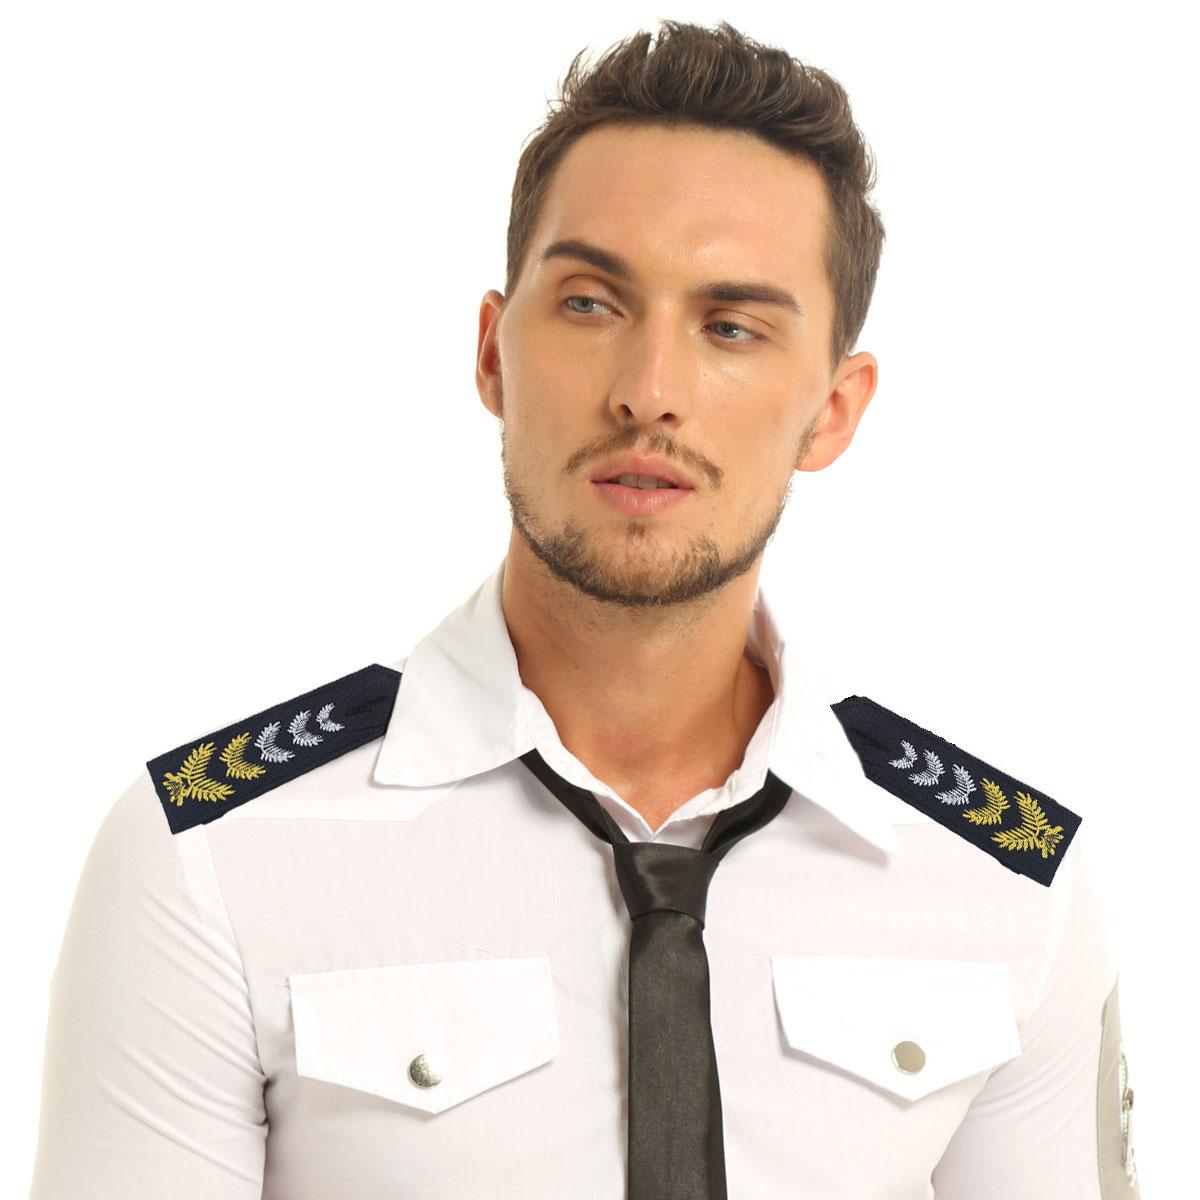 Sold as Pairs Security Workwear Bouncer Shoulder Epaulette Epaulettes Uniform